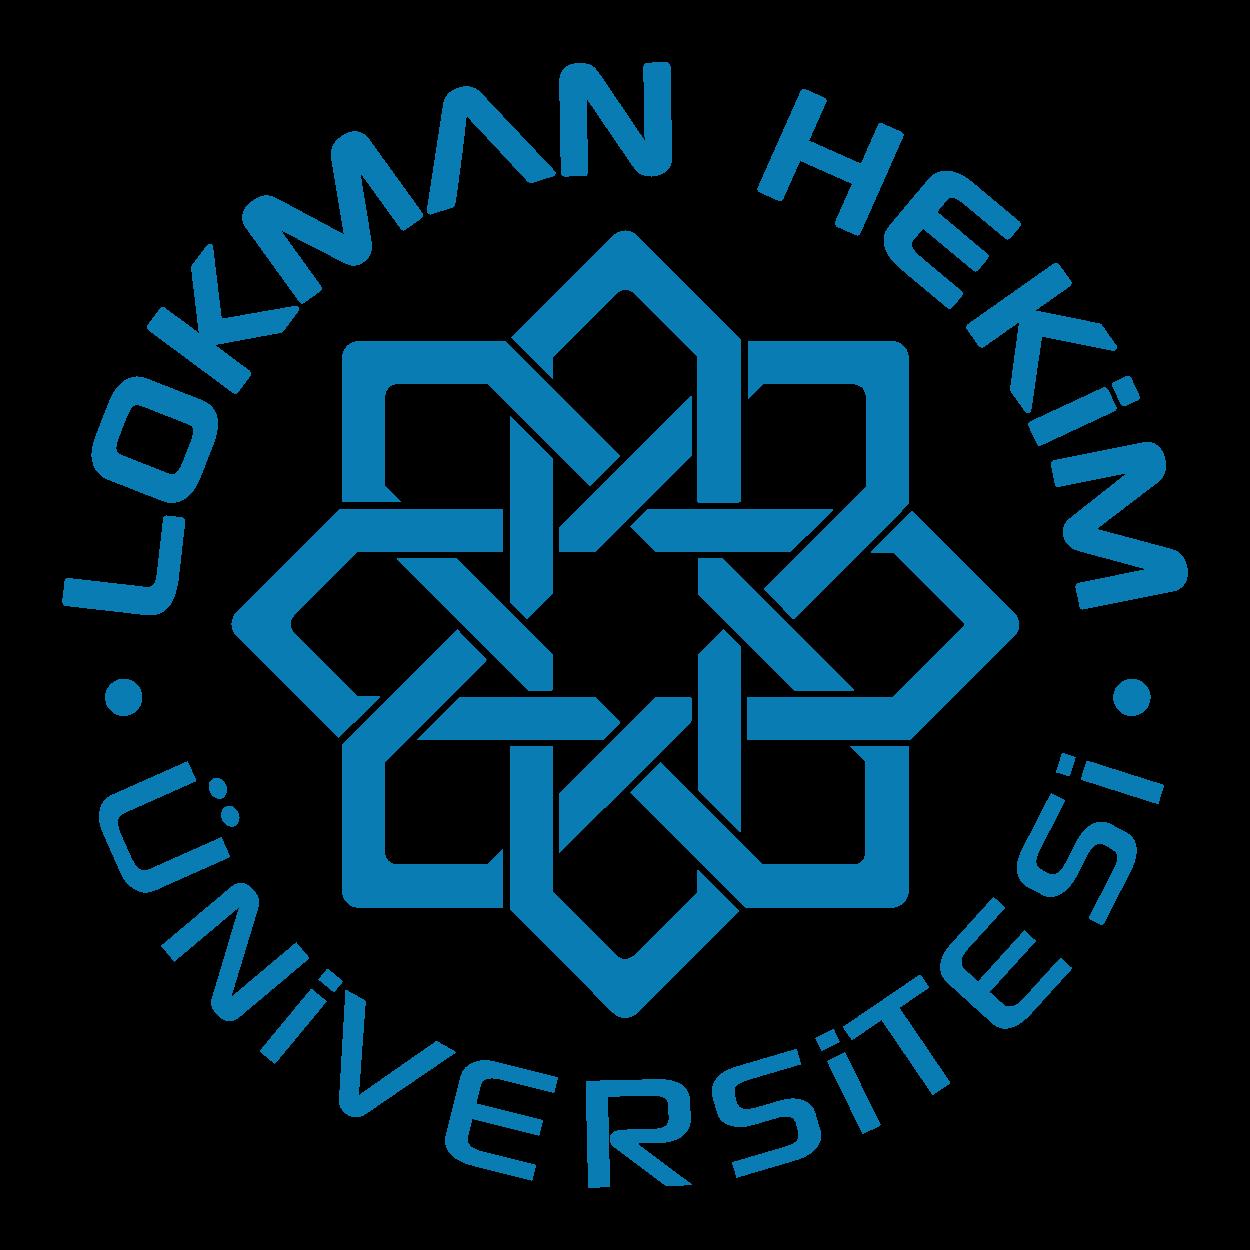 Lokman Hekim Üniversitesi Logo (Ankara) png